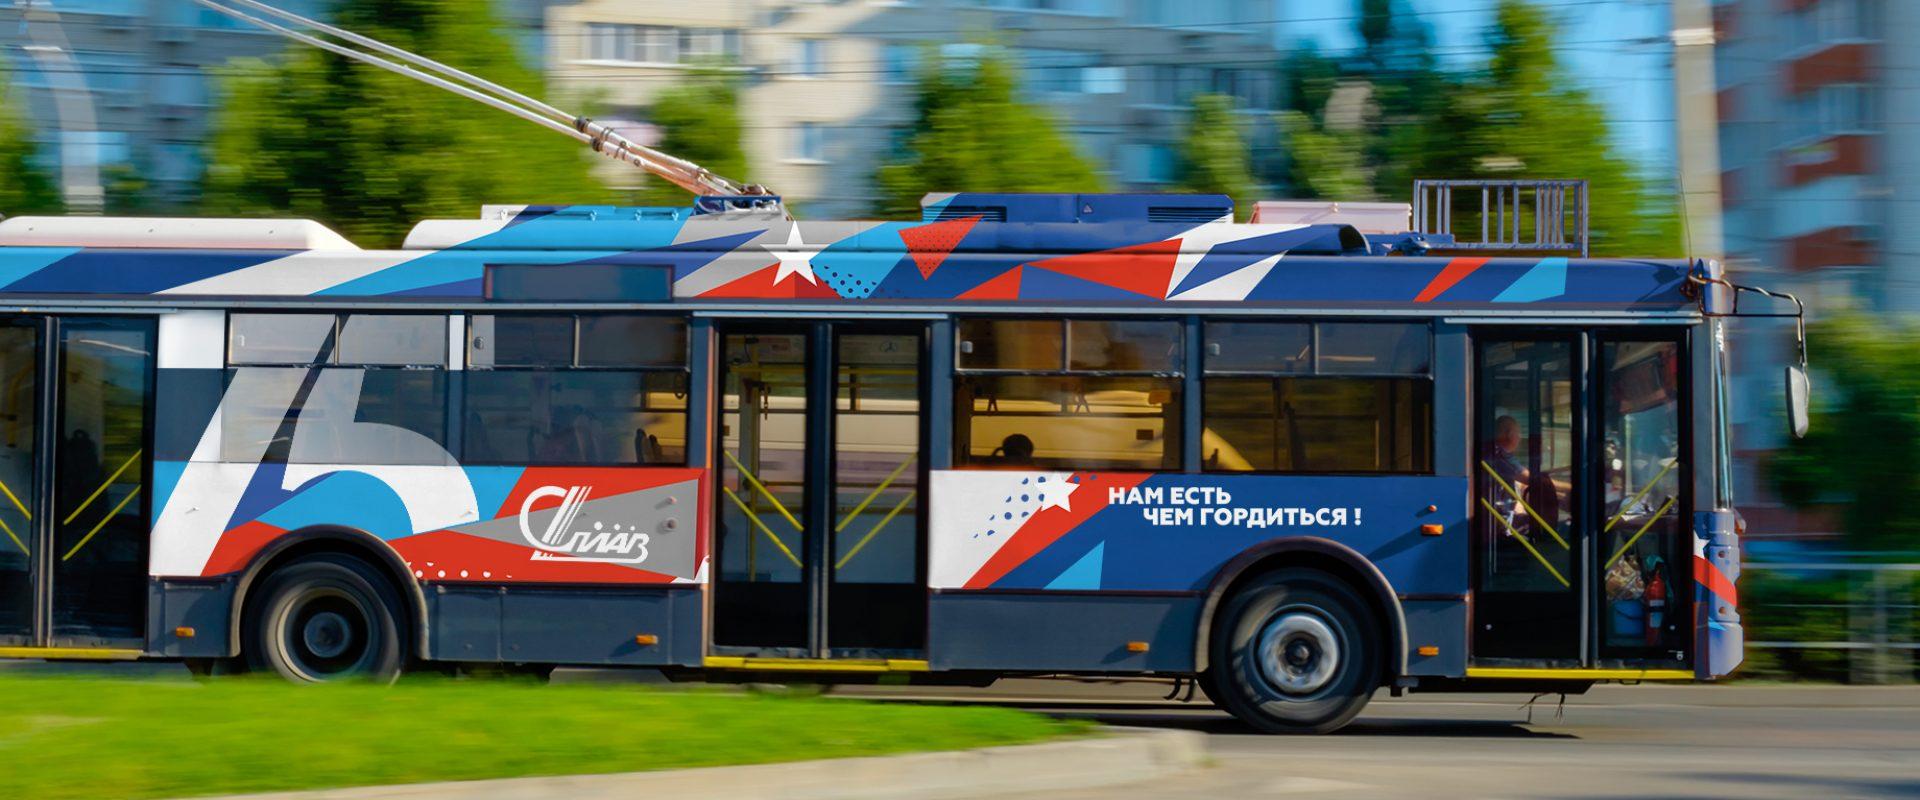 splav_обложка2_тролейбус